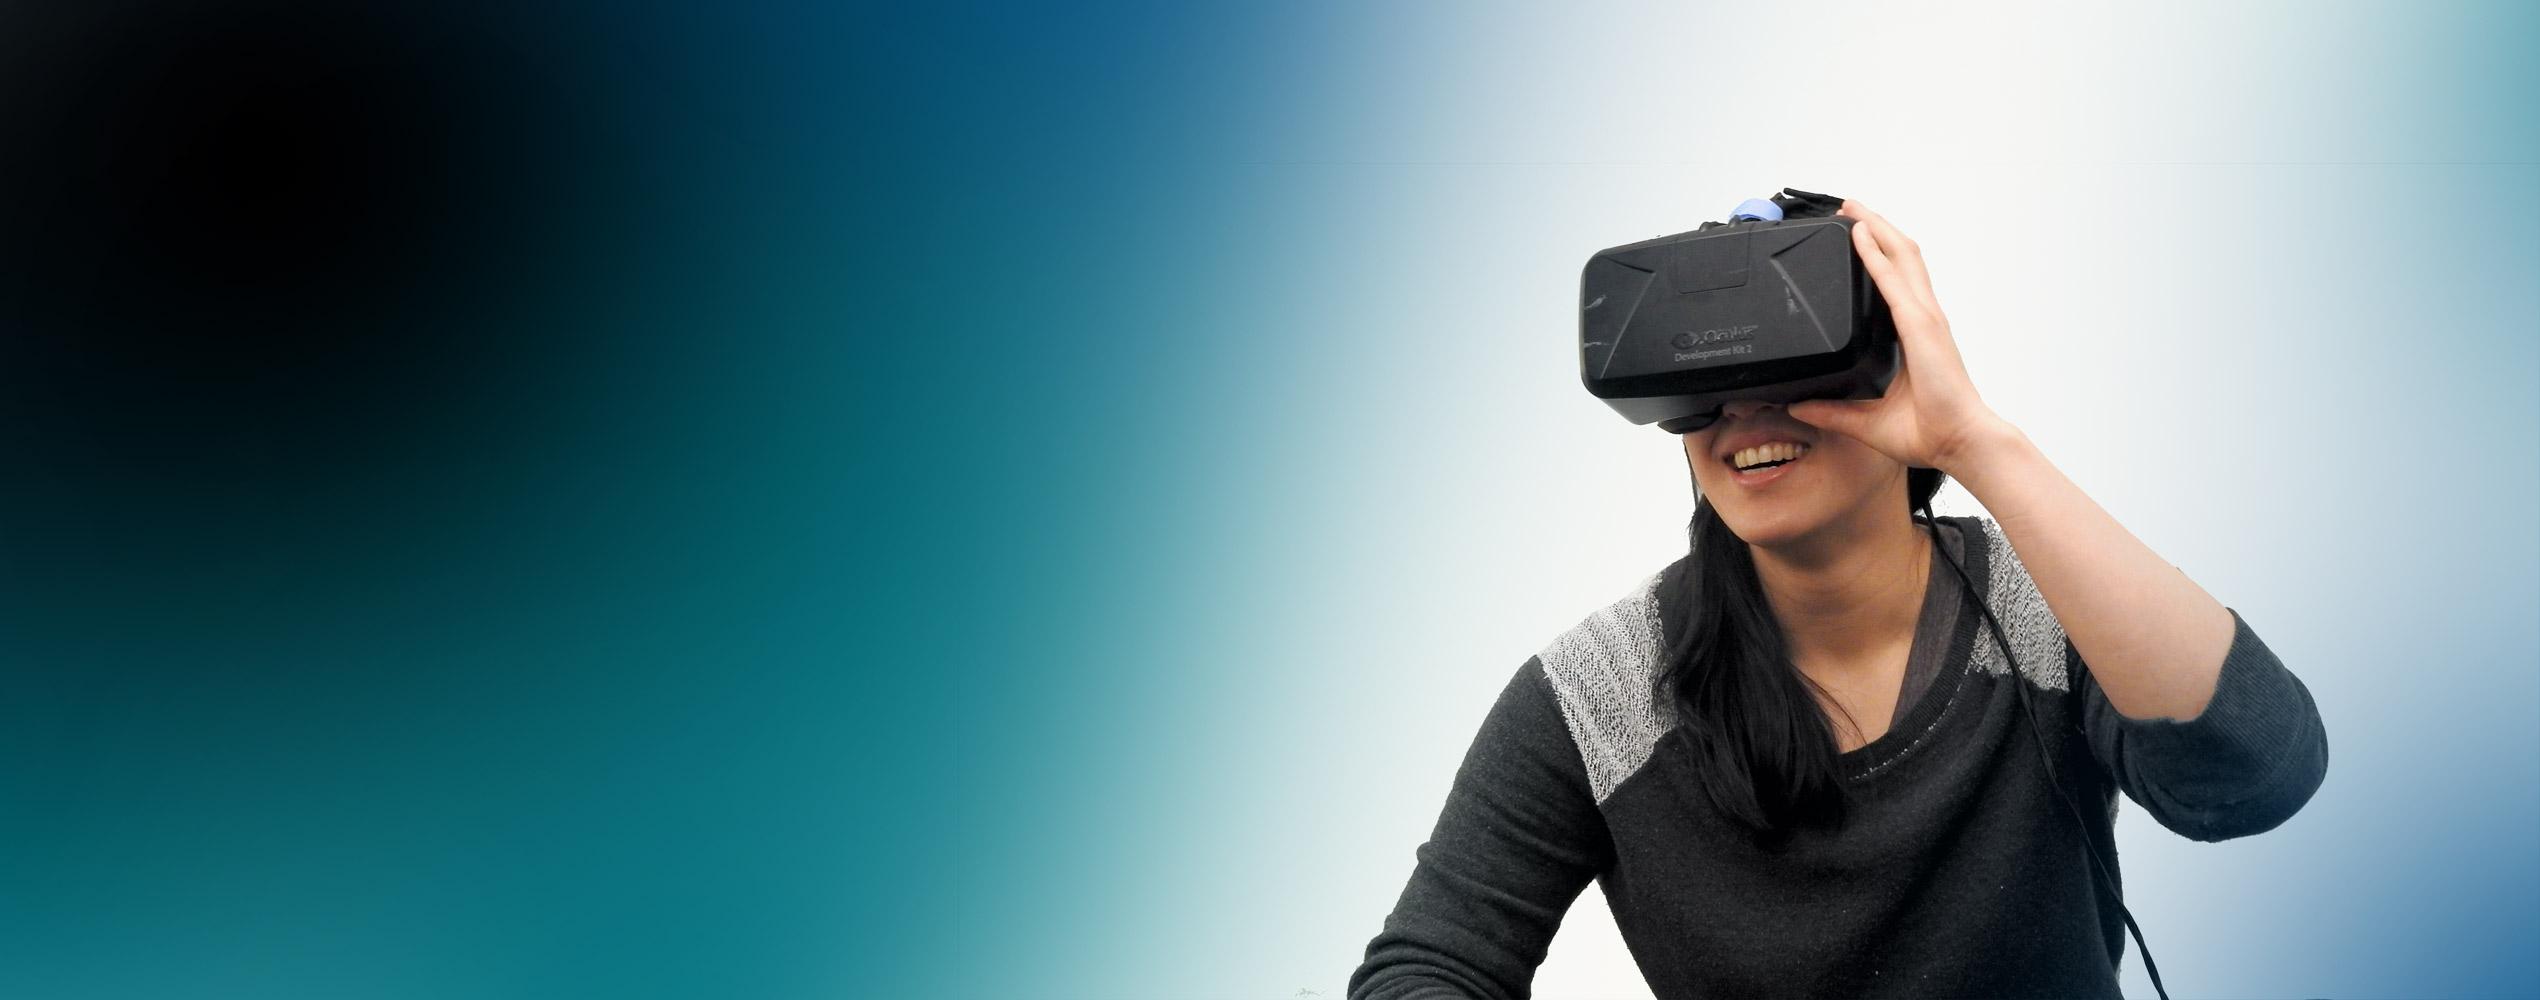 HEADER-pixabay-HammerAndTusk-virtual-reality-1389040-2540x1000